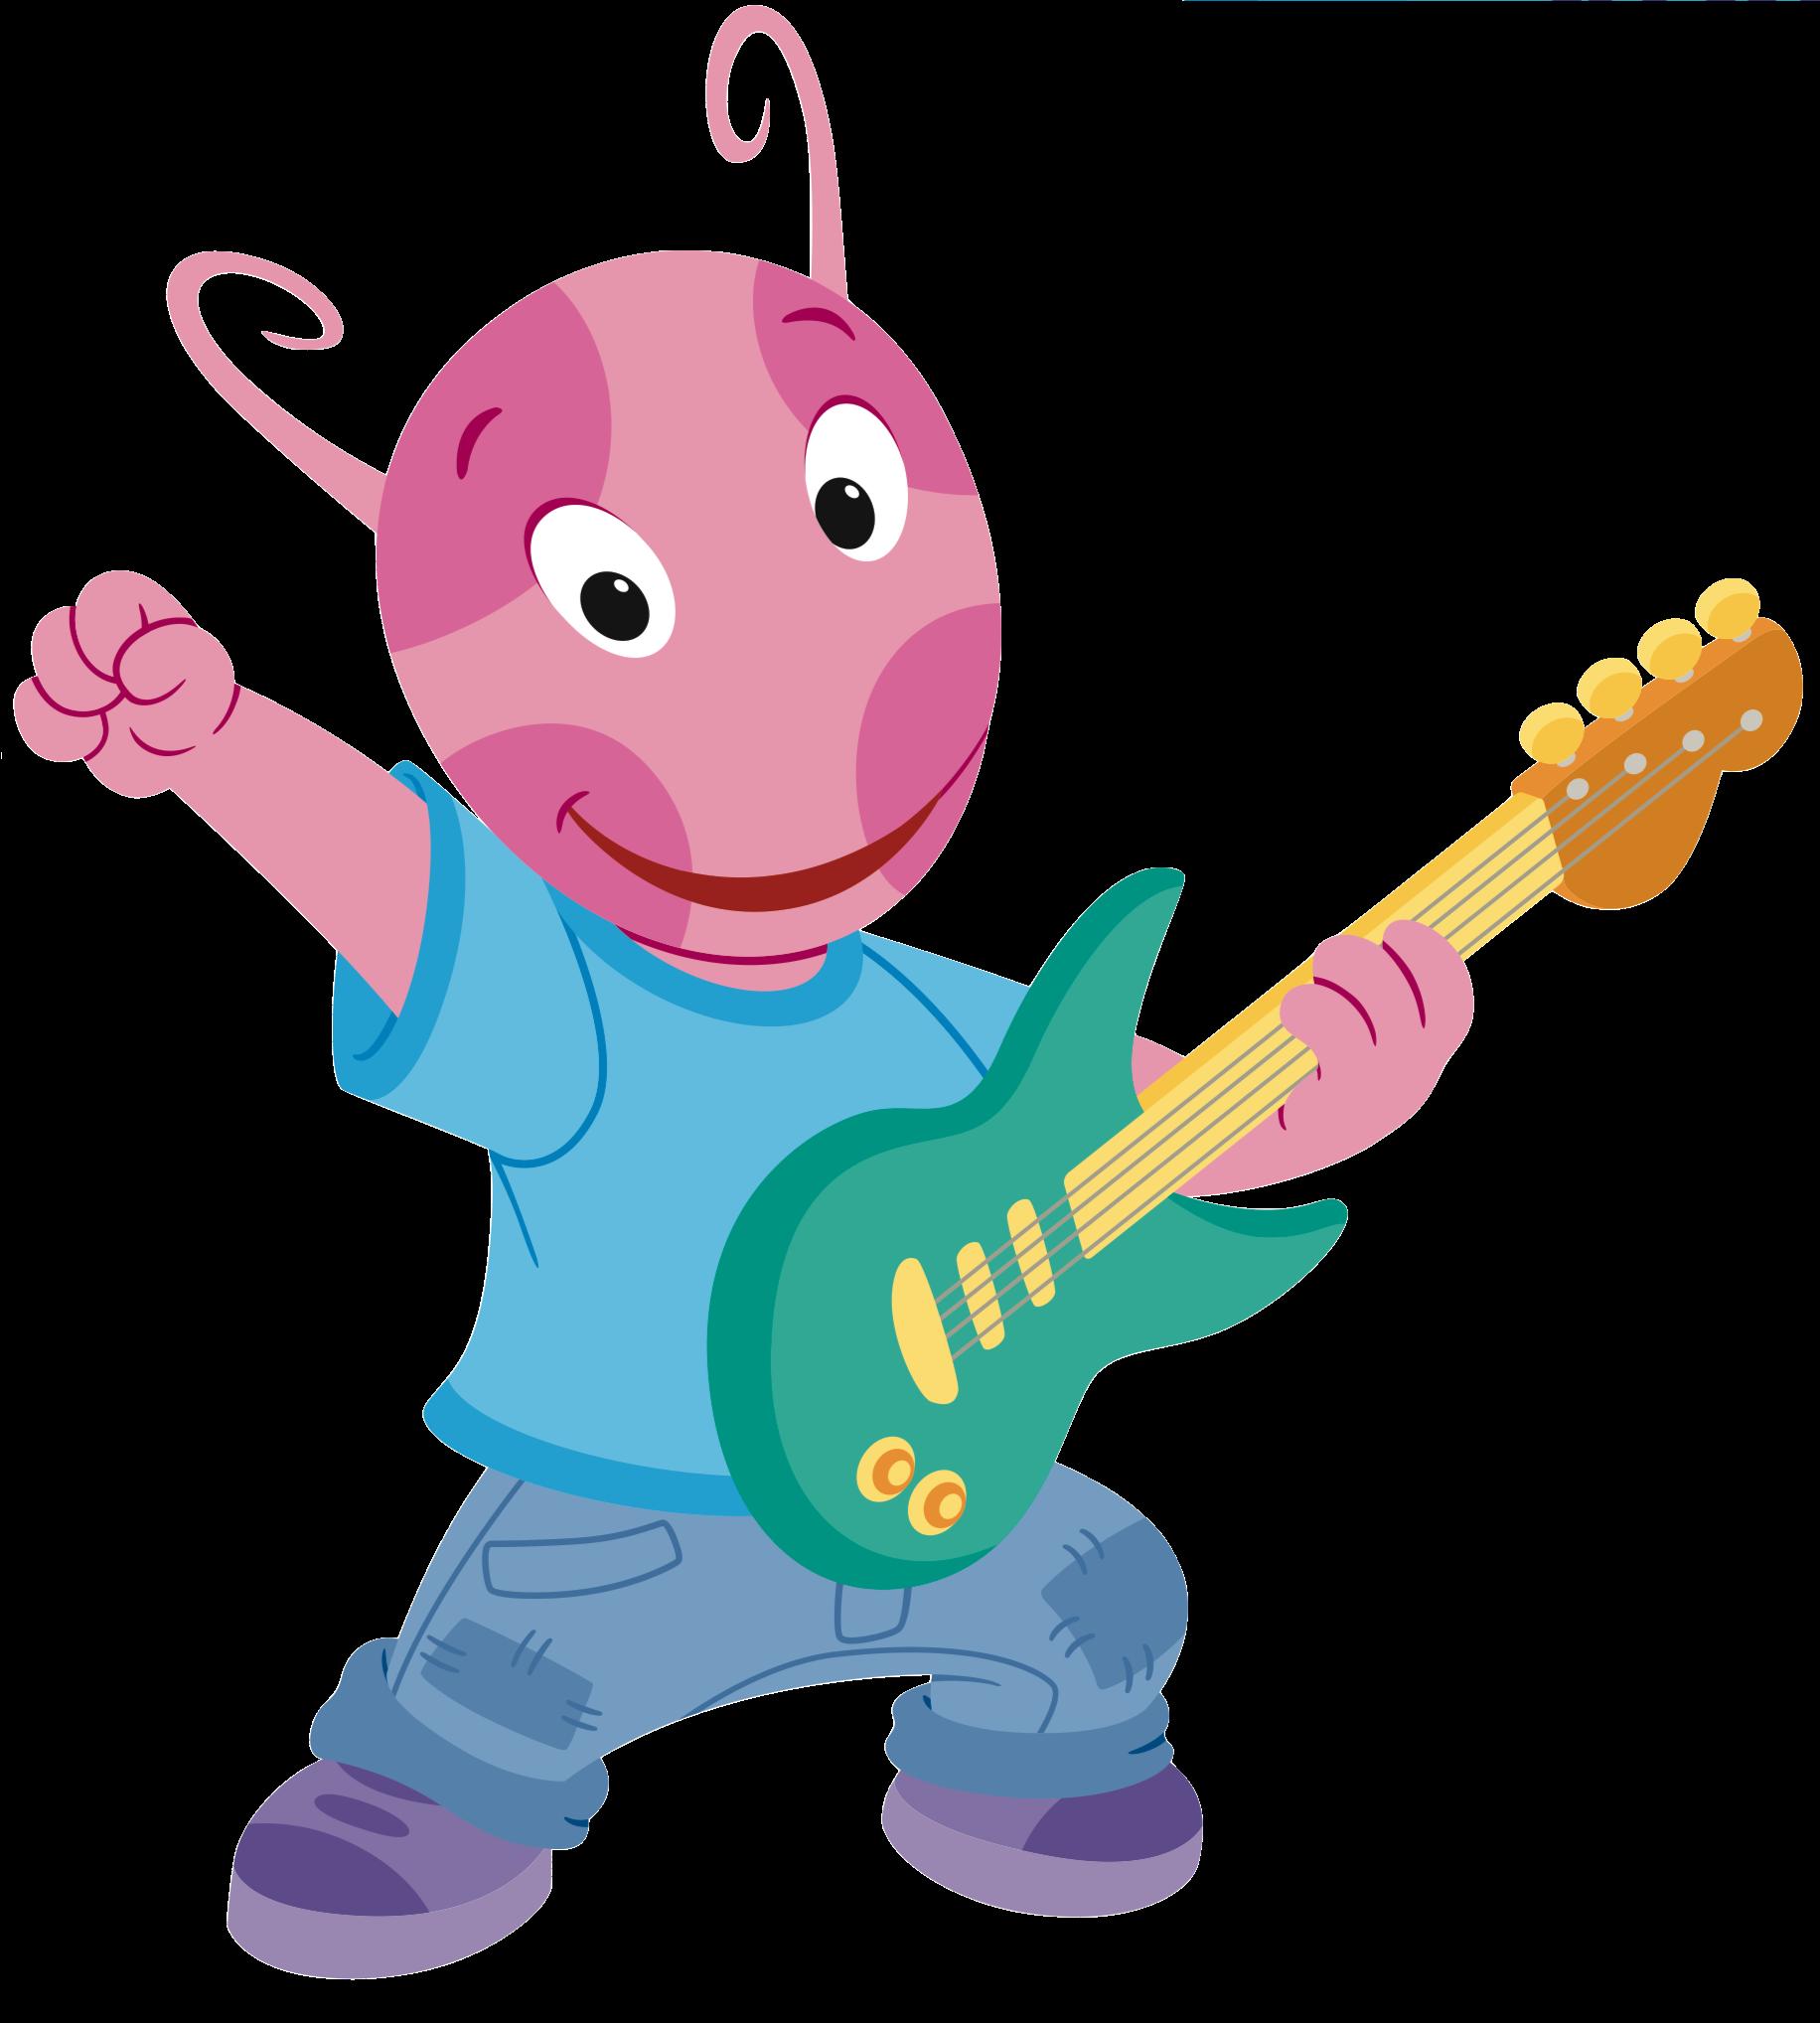 Play clipart let's play. Guitarist uniqua the backyardigans